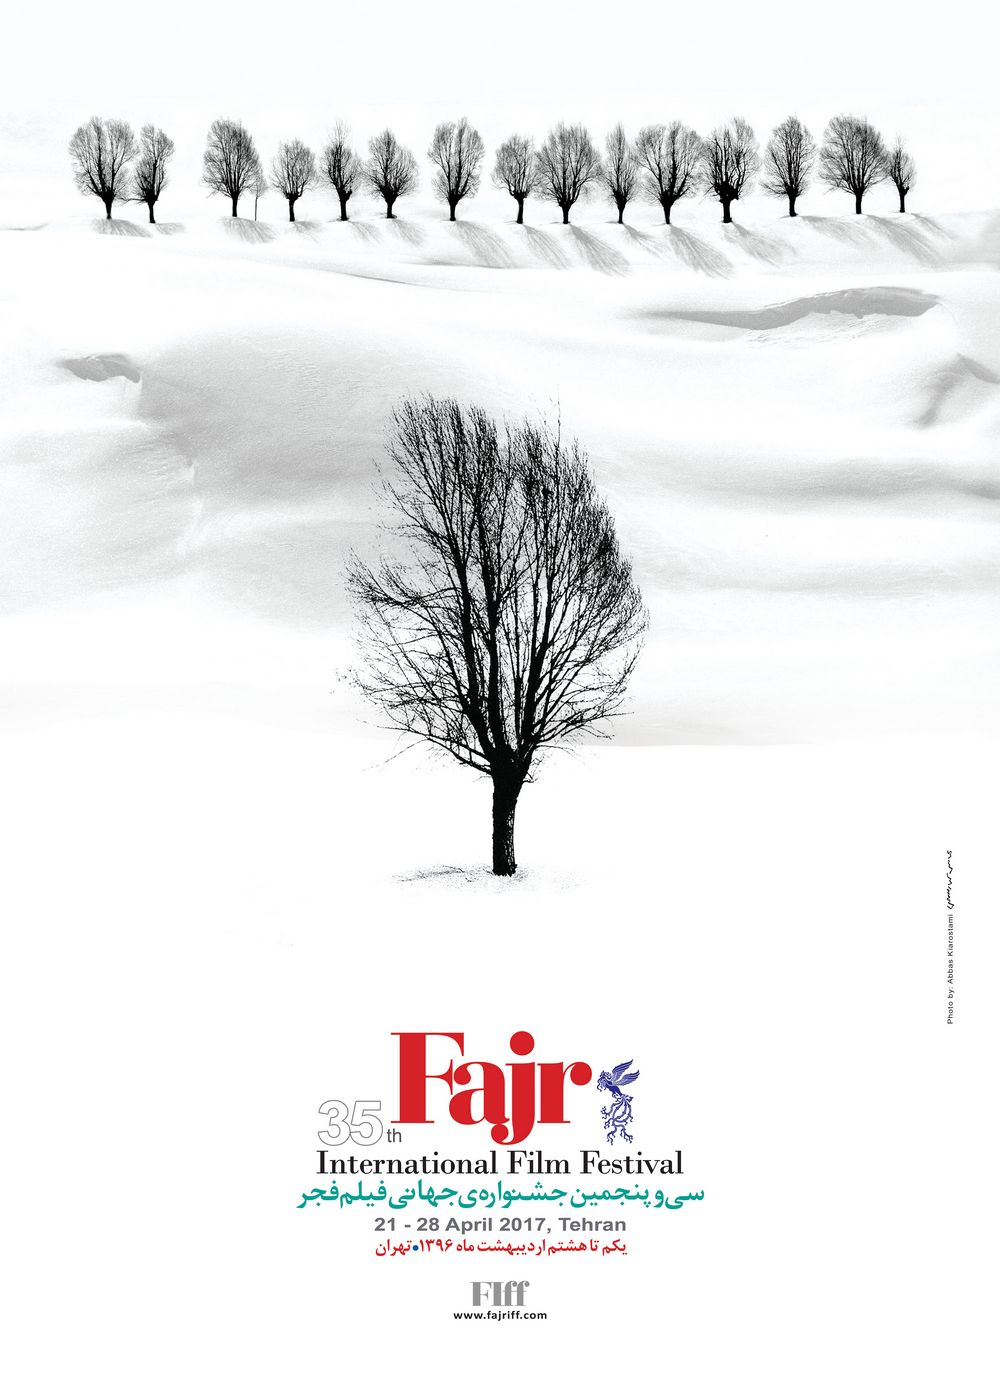 FIFF35-Poster-2017